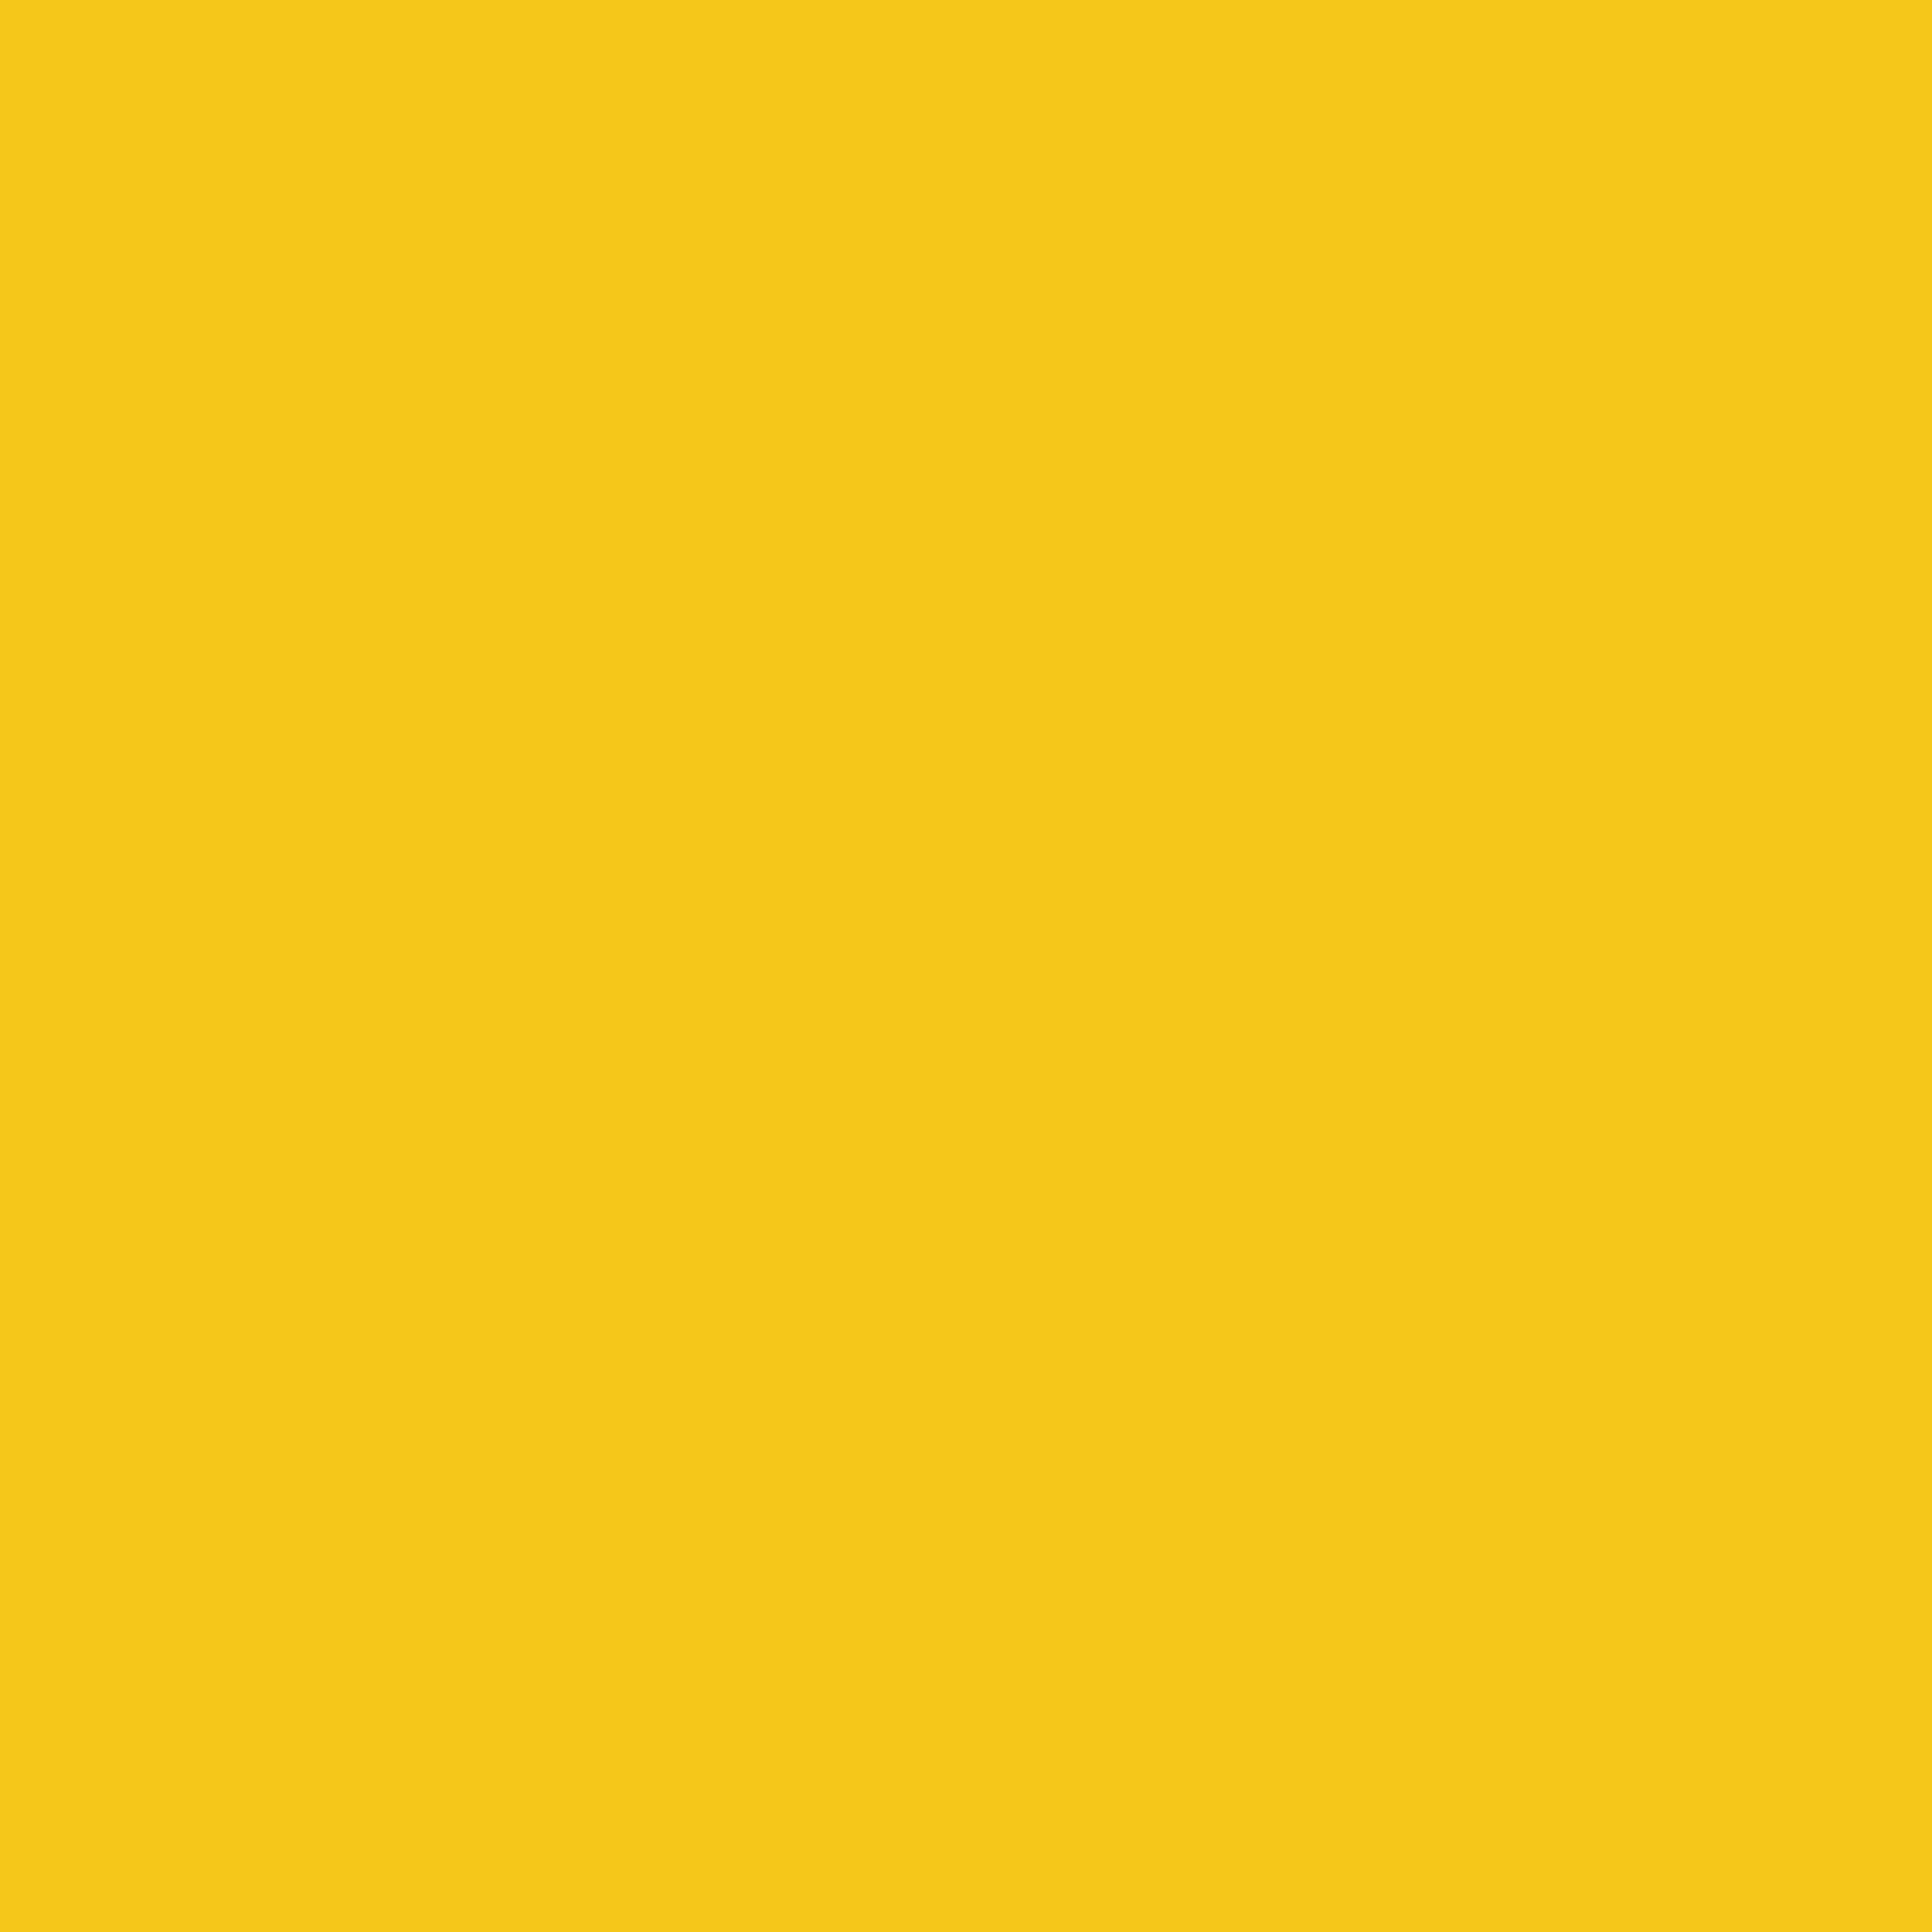 3600x3600 Deep Lemon Solid Color Background